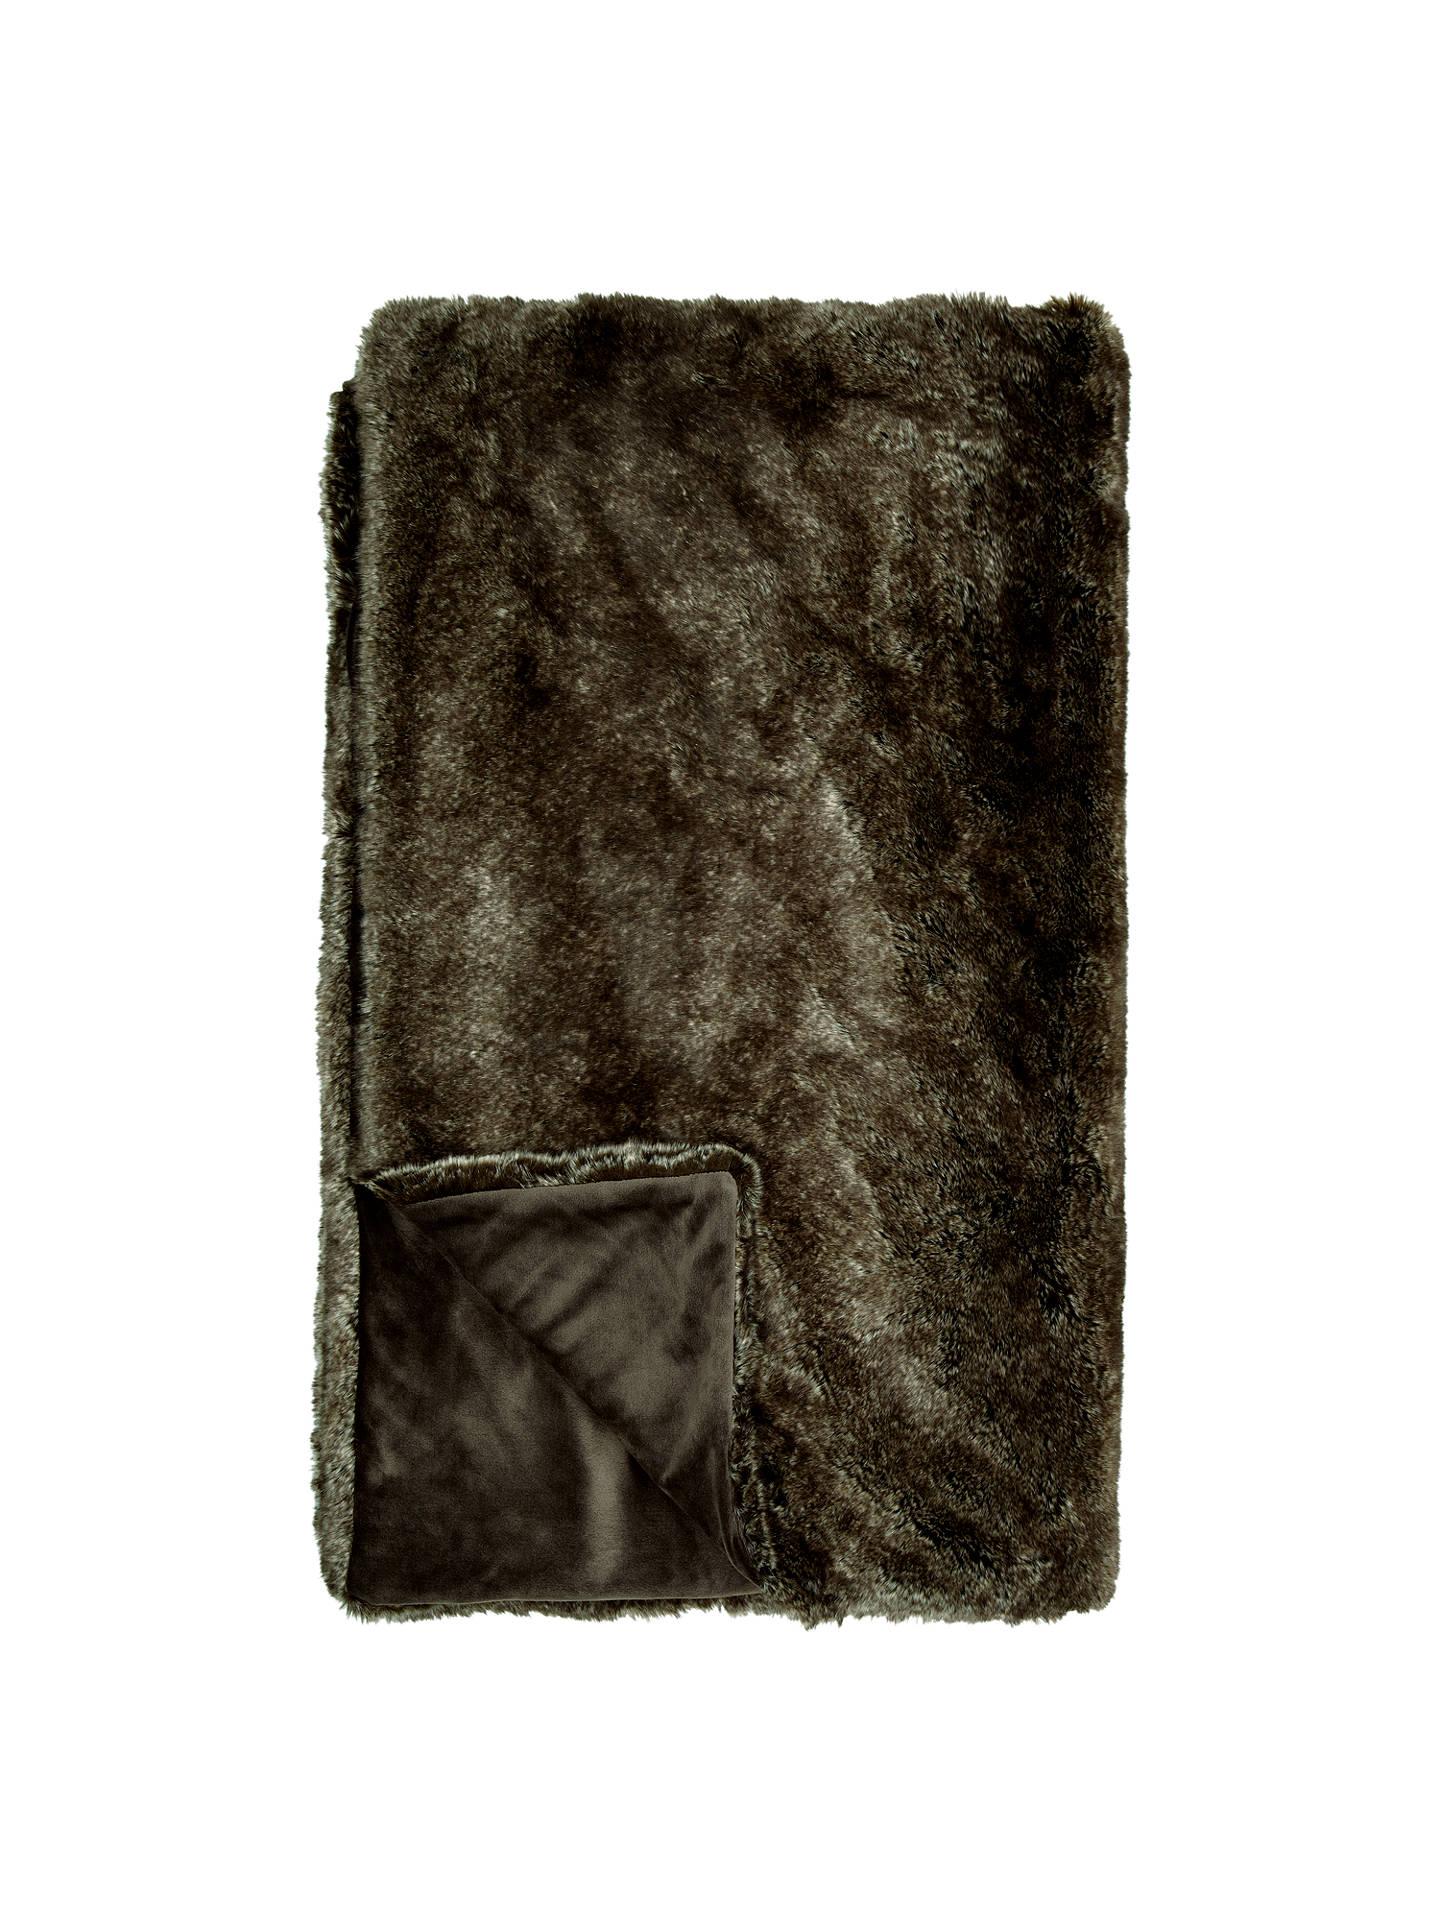 john lewis faux fur throw dark brown at john lewis partners. Black Bedroom Furniture Sets. Home Design Ideas